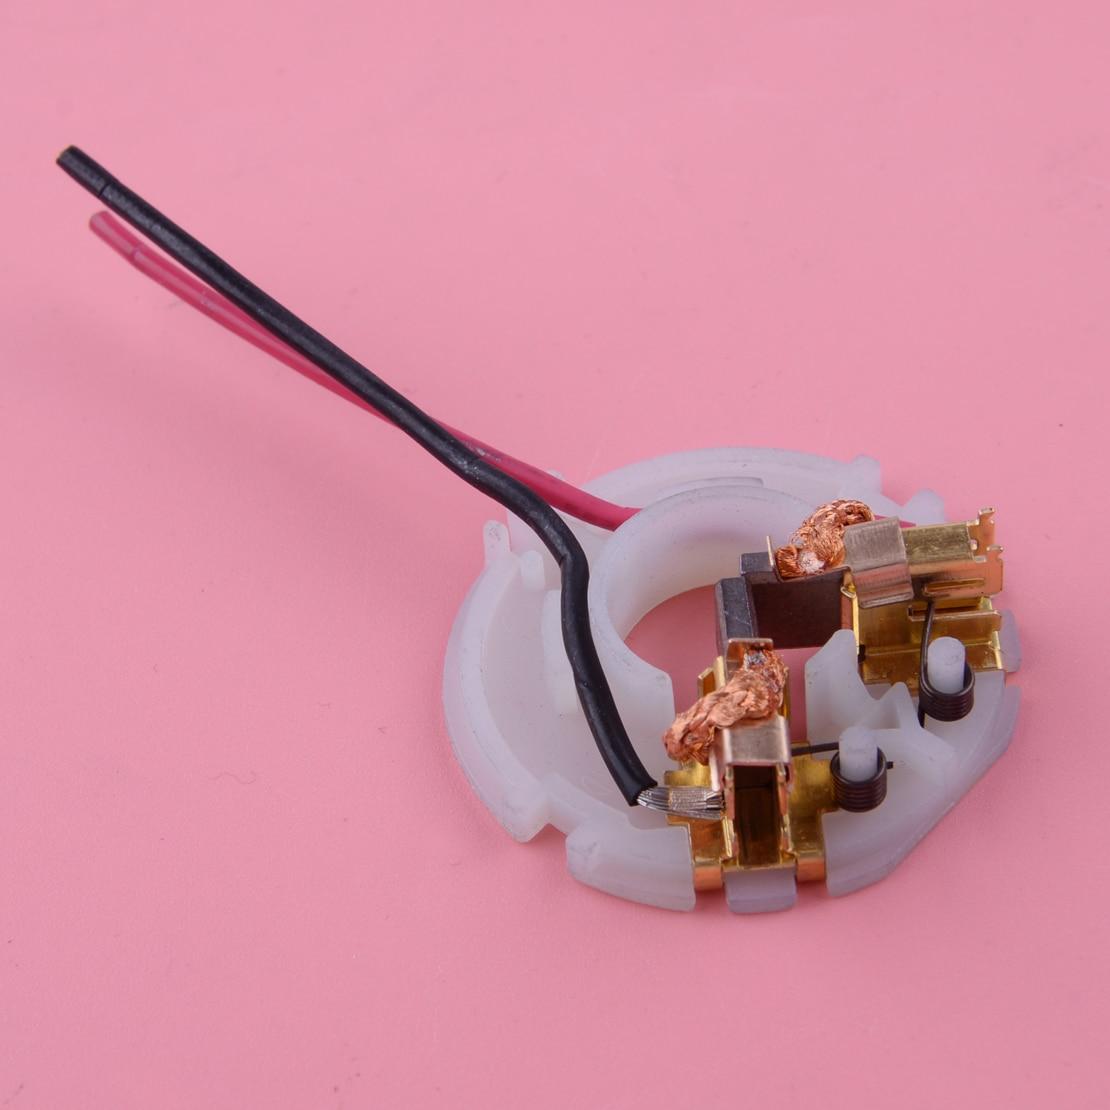 LETAOSK Armature Brush Holder Carbon Brushes Fit For Makita DF458D BHP448 BDF458 BDF448 DF444D CB-440 638991-1 638614-1 CB-440